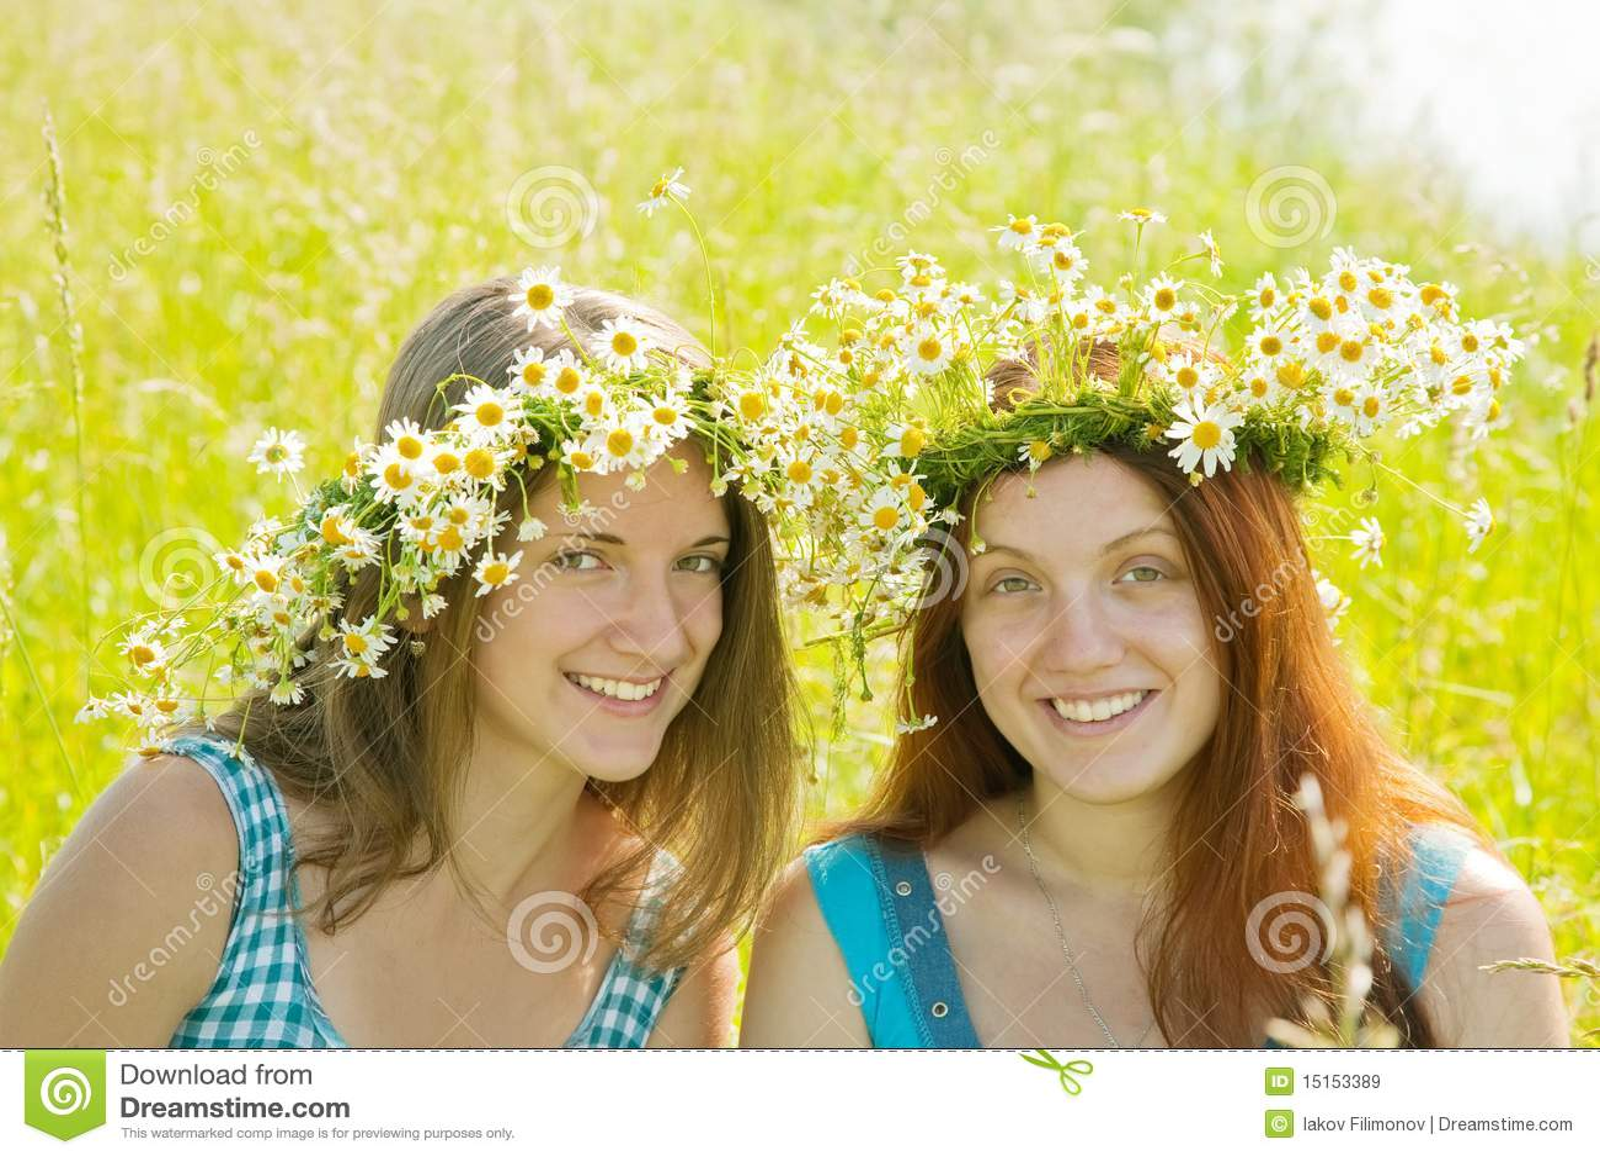 Portrait of girls in wreaths